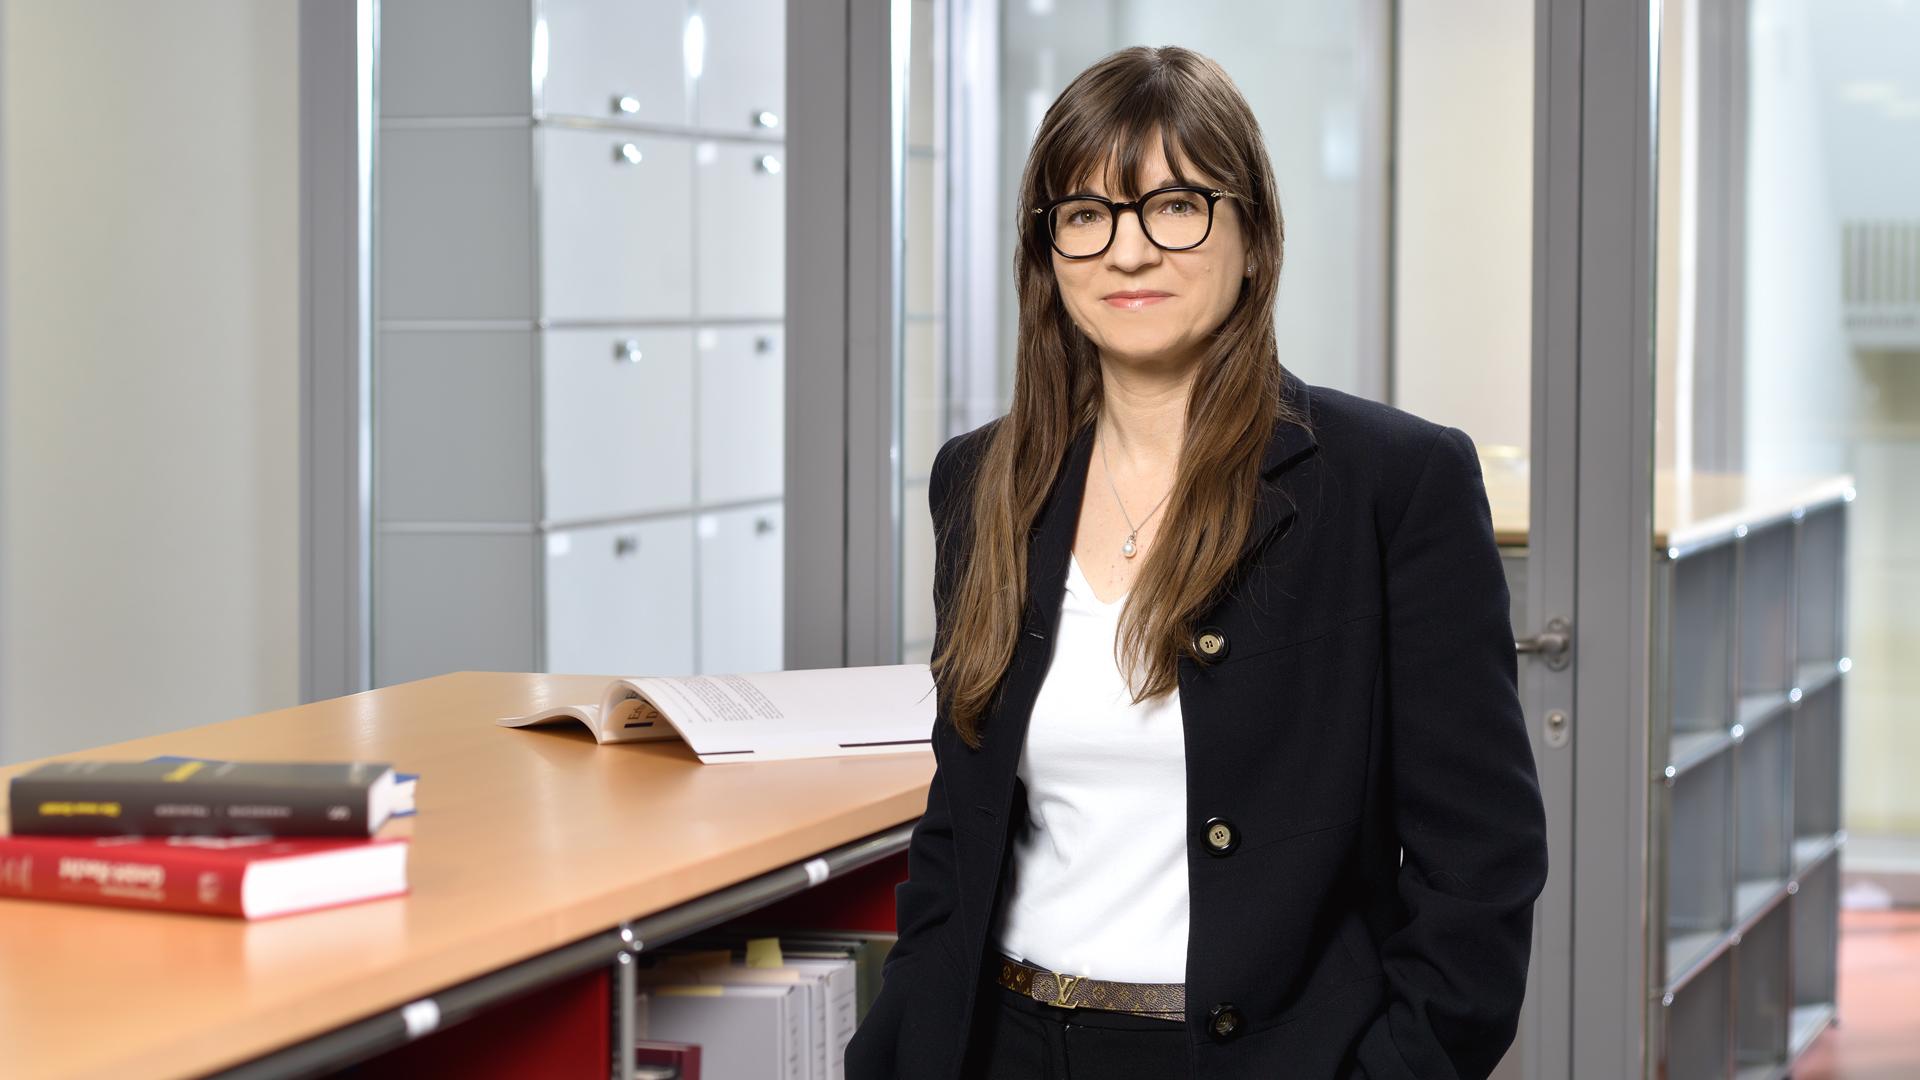 Nicole Cataldo